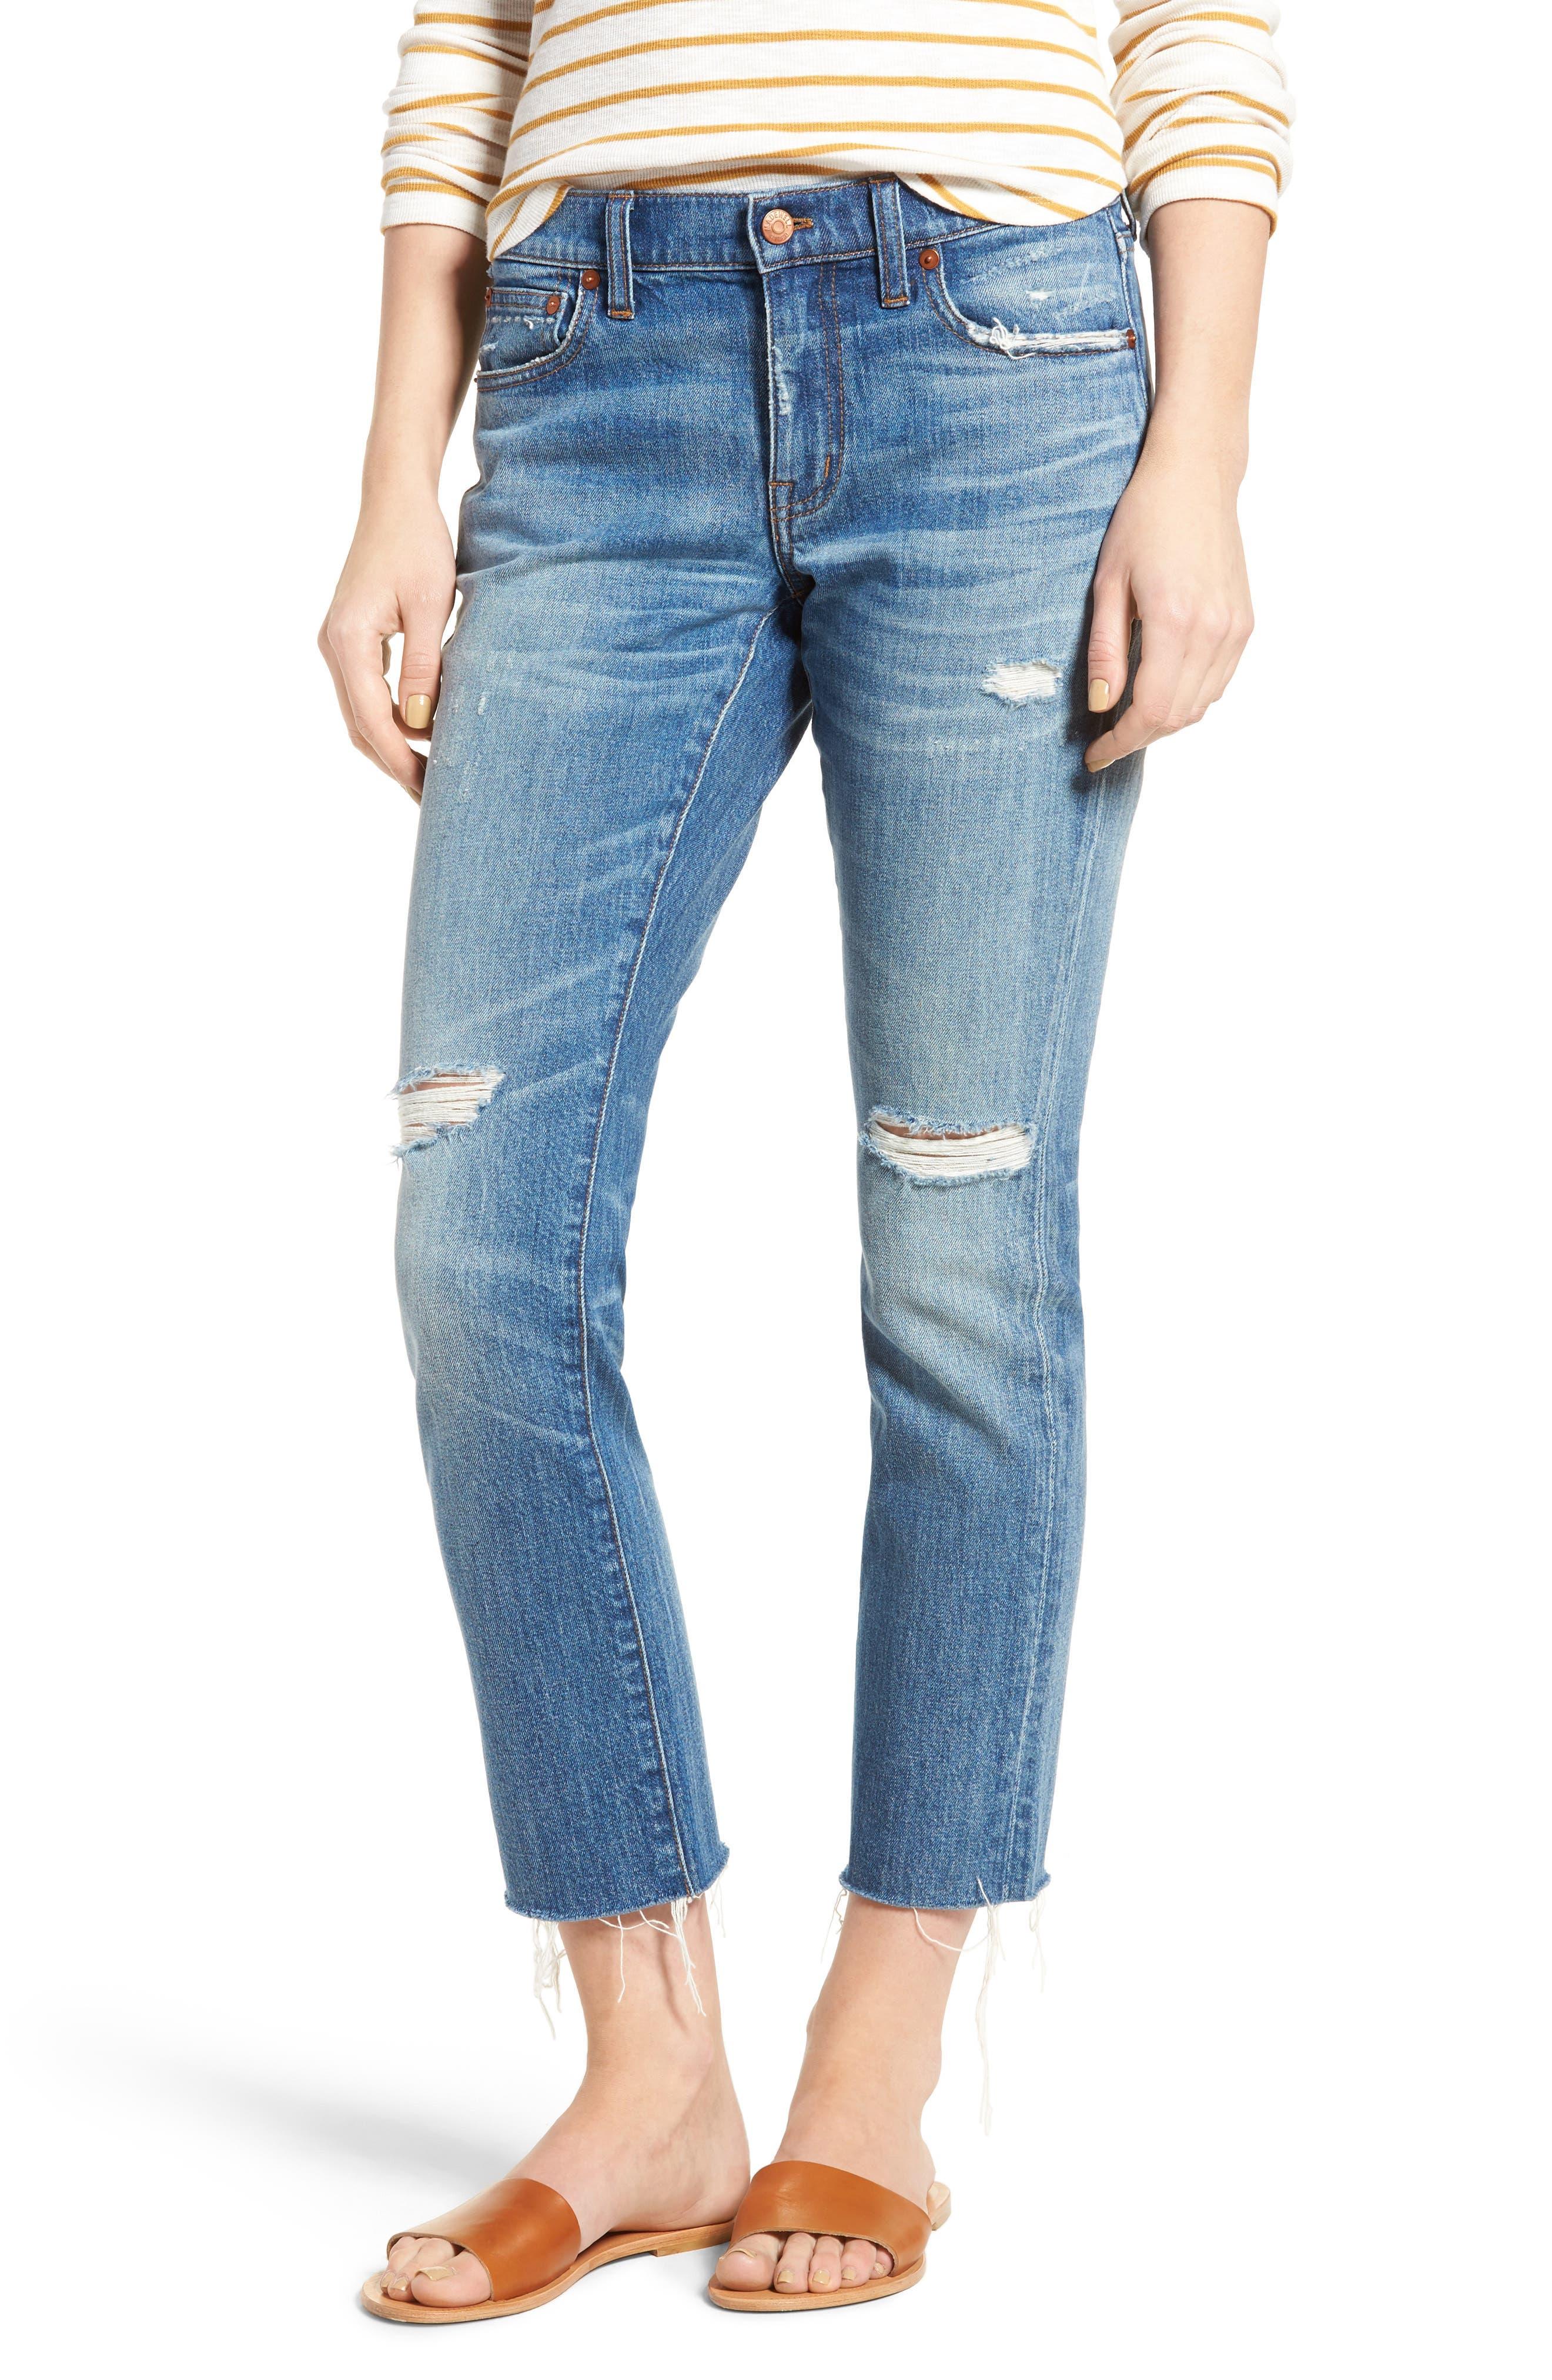 Madewell The Slim Boyjean Boyfriend Jeans (Bennie Wash)